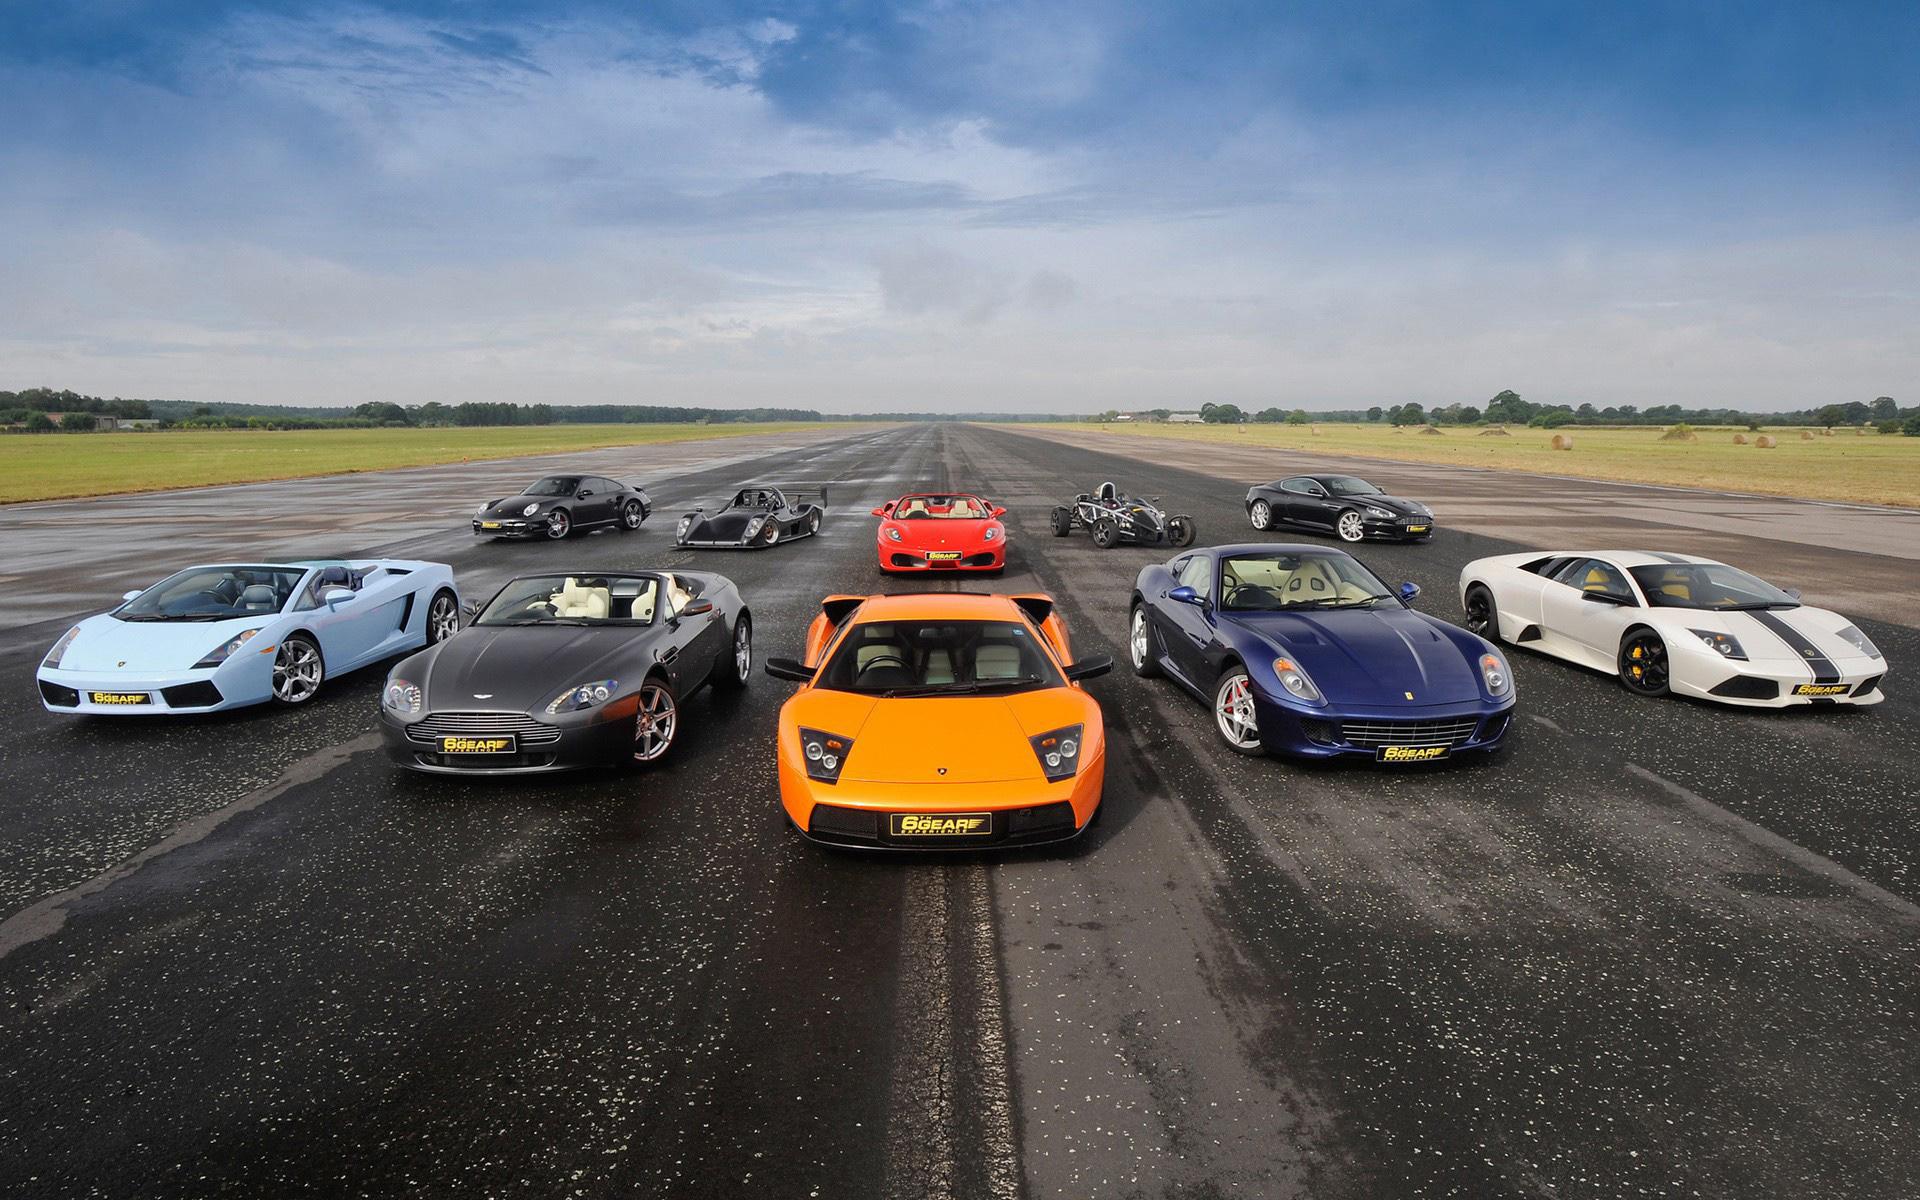 6th Gear Racing Cars Wallpaper | HD Car Wallpapers| ID #2773